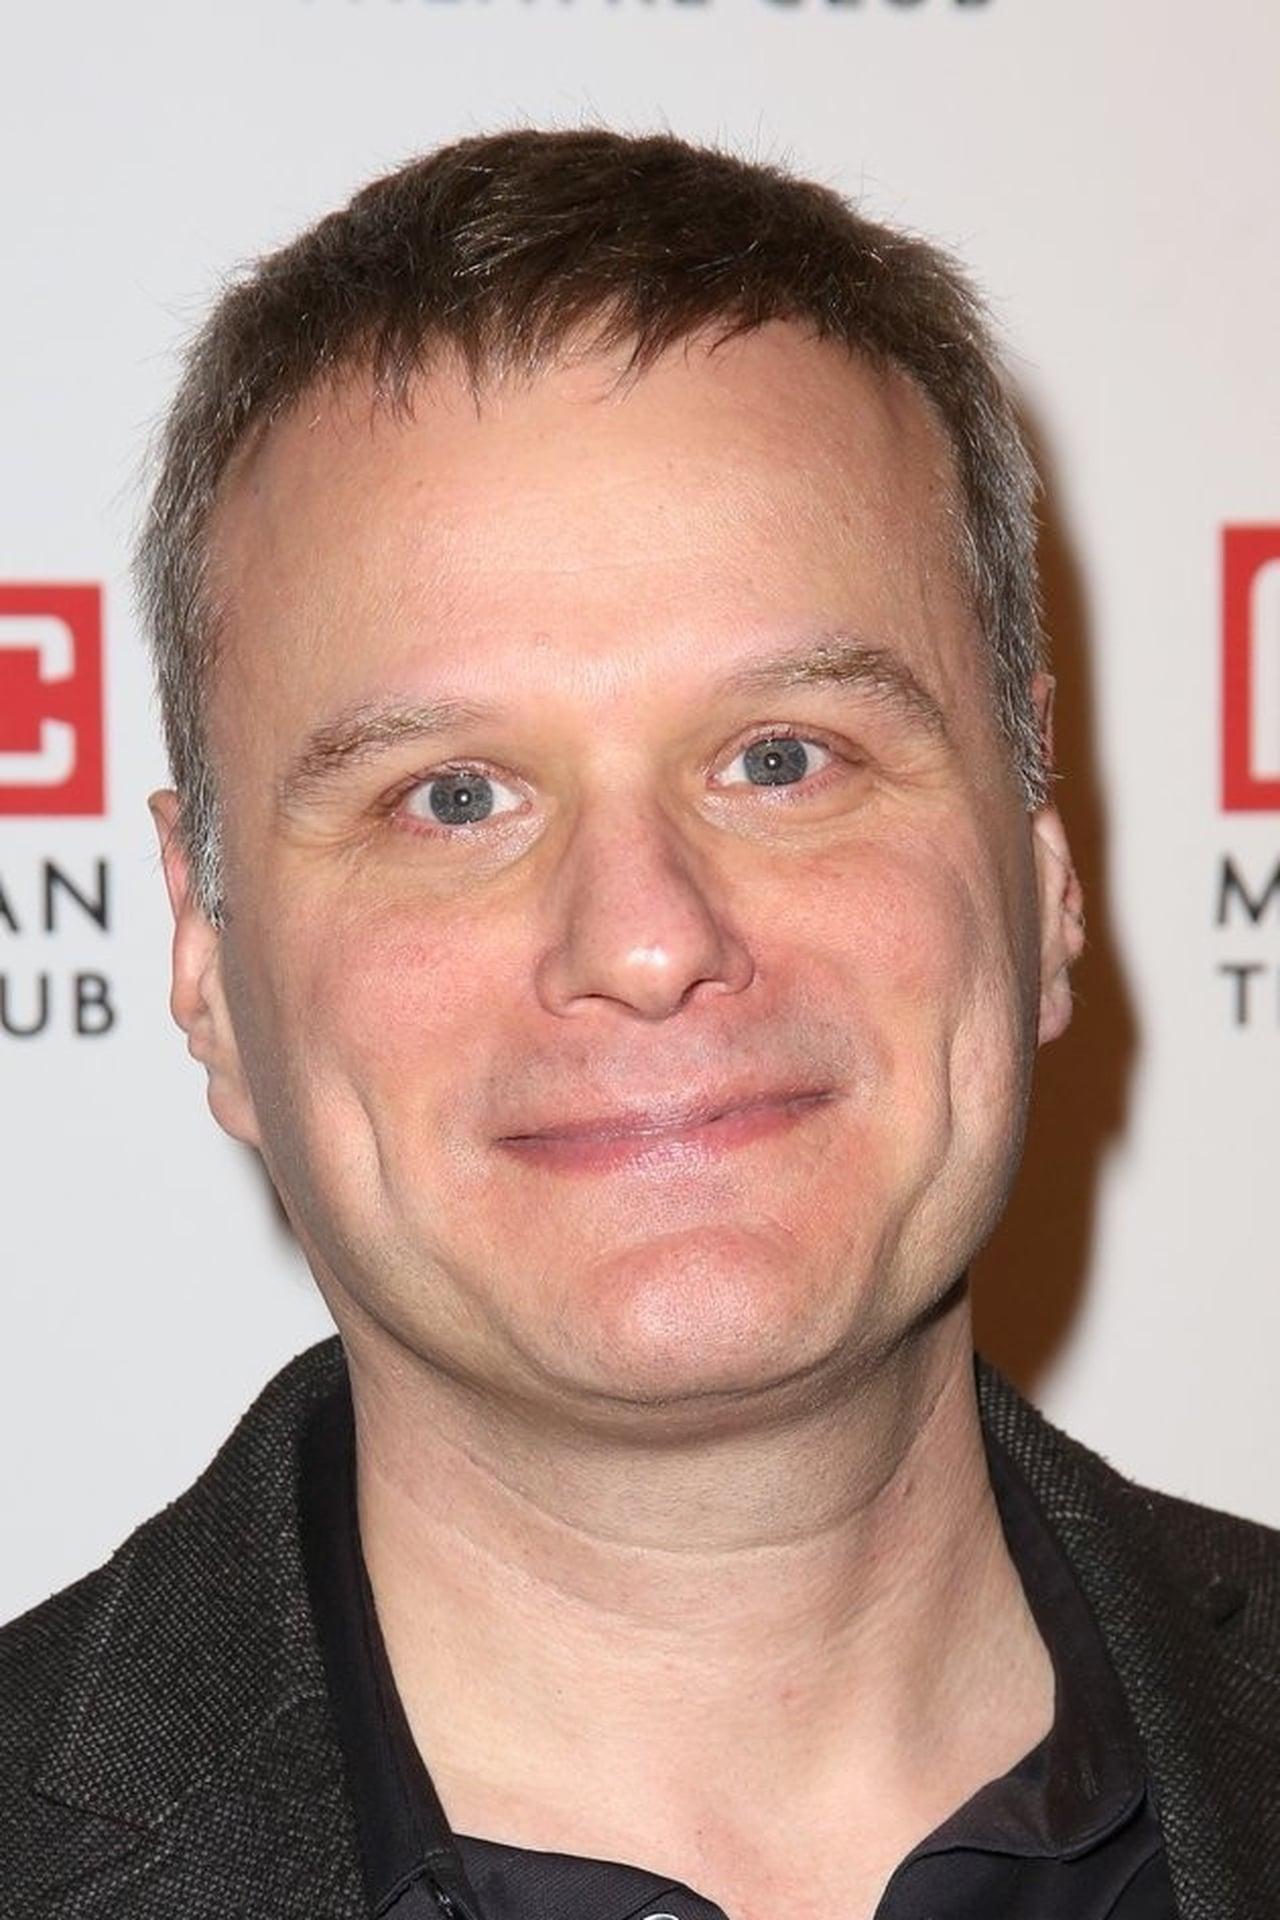 Chris McGarry